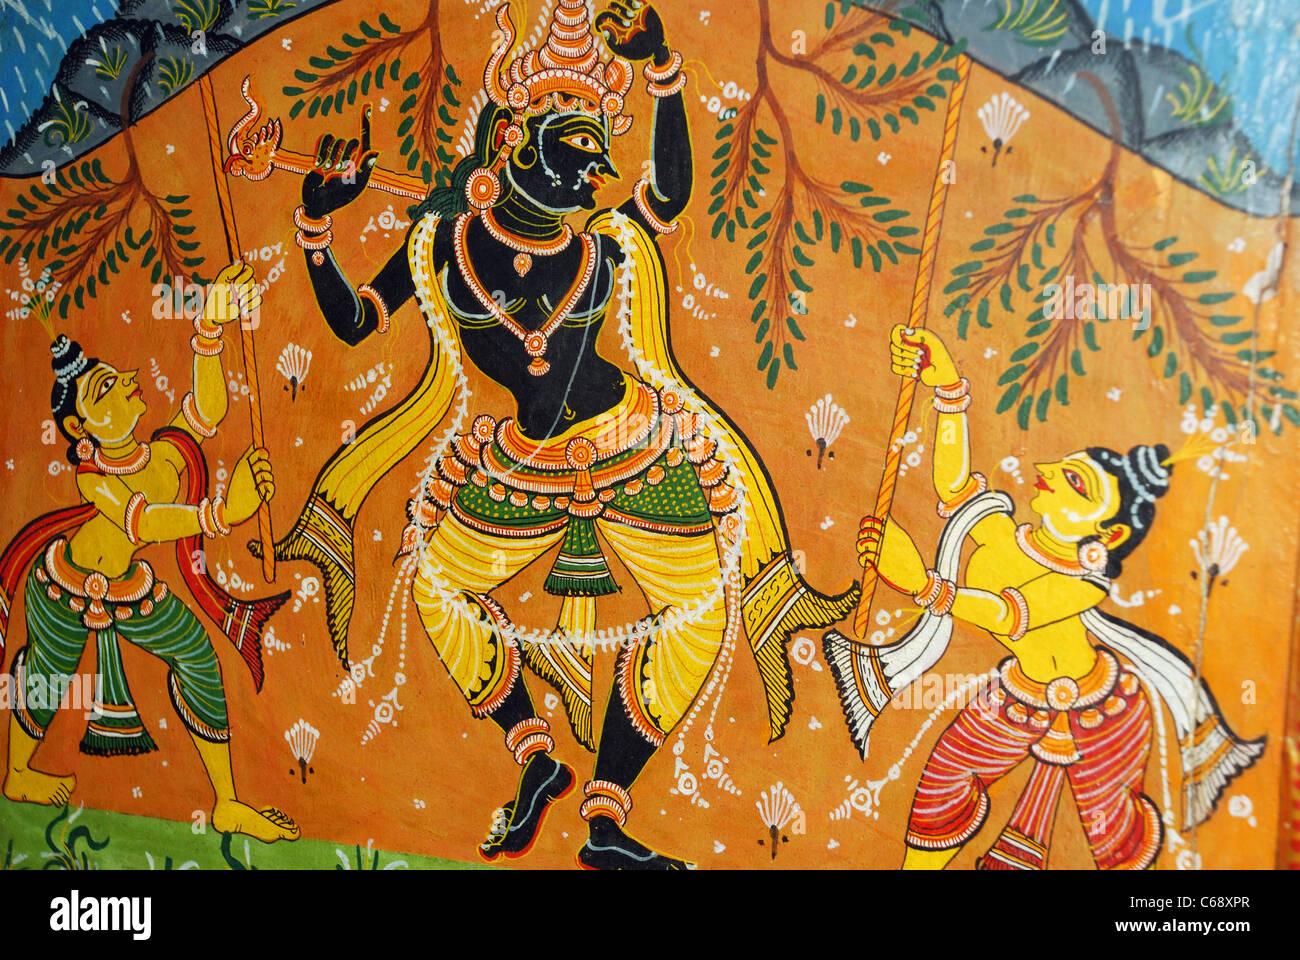 Lord Krishna Painting Stock Photos & Lord Krishna Painting Stock